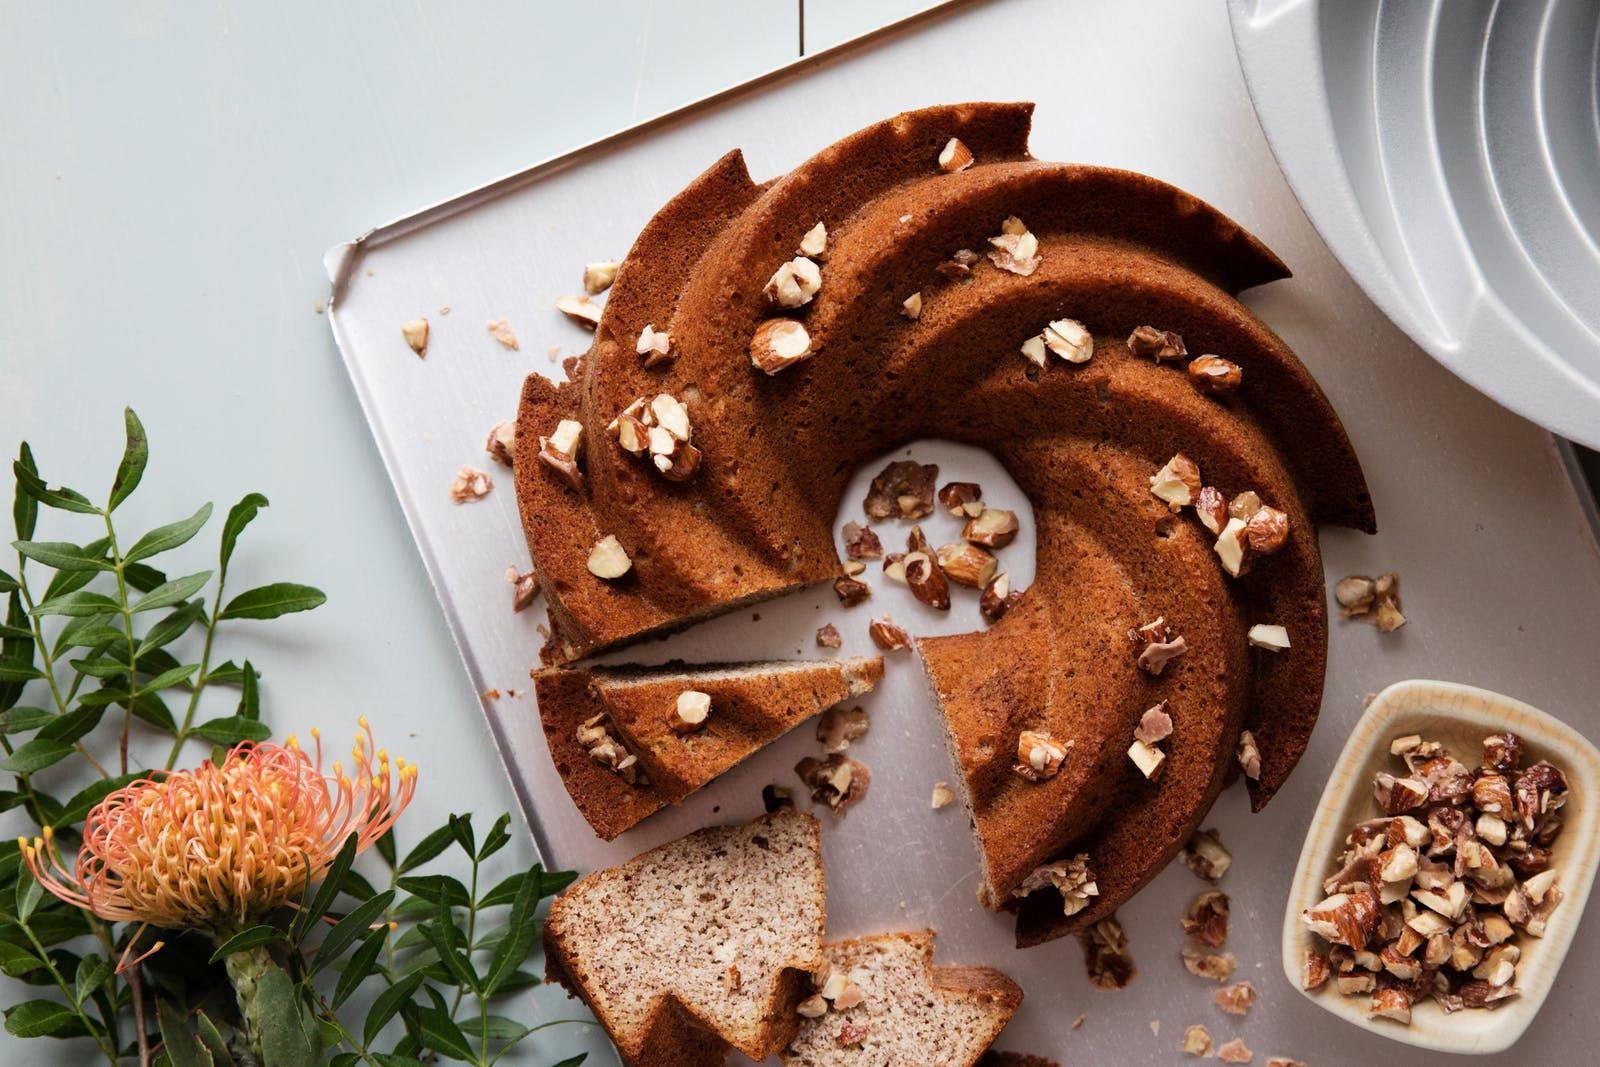 Keto Gingerbread Bundt Cake